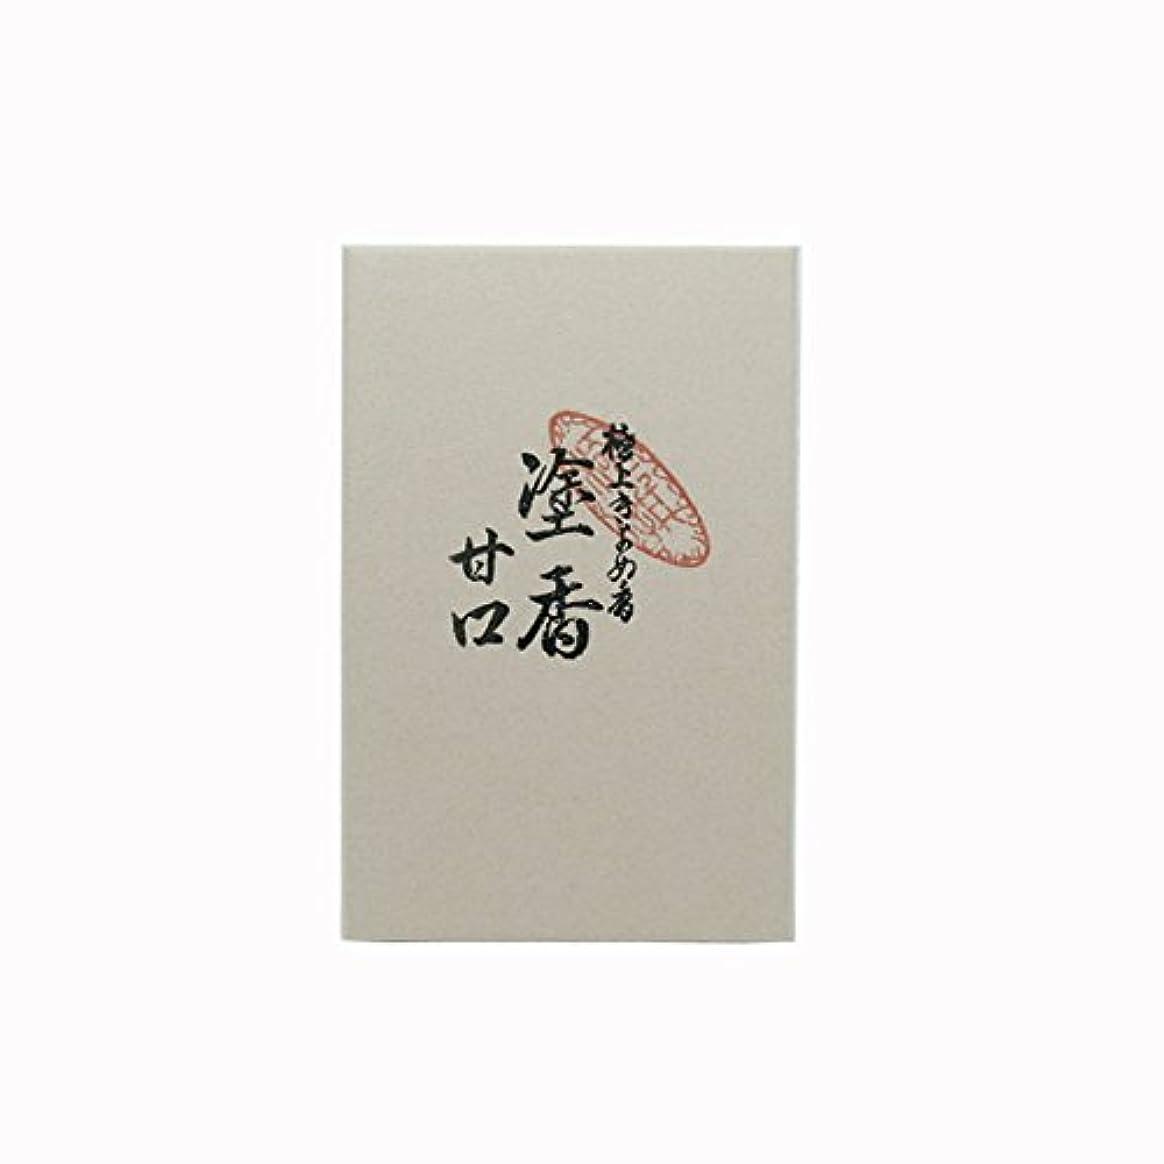 結果五頑固な塗香(甘口) 12g入